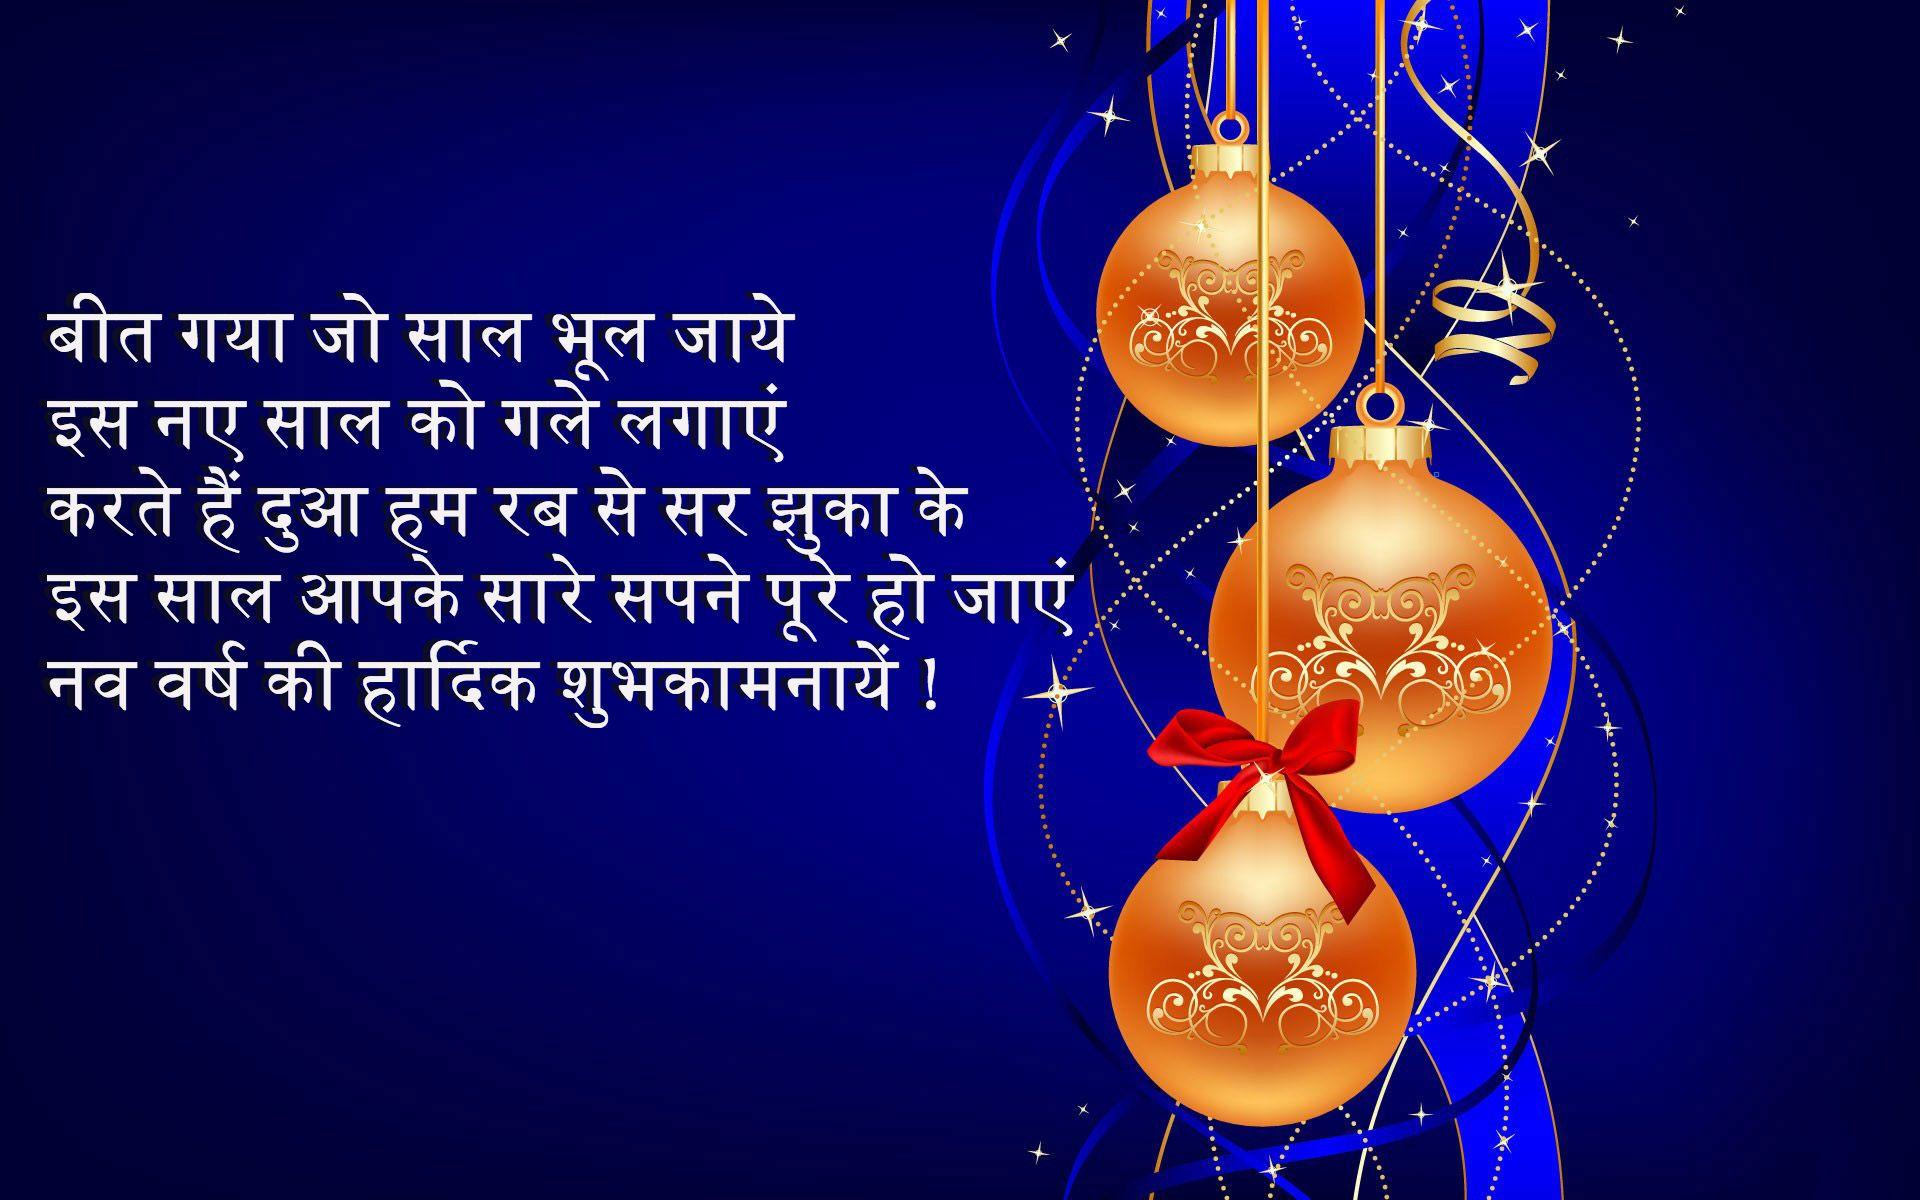 New year shayari image naya saal in hindi with image happy new new year shayari image naya saal in hindi with image kristyandbryce Gallery